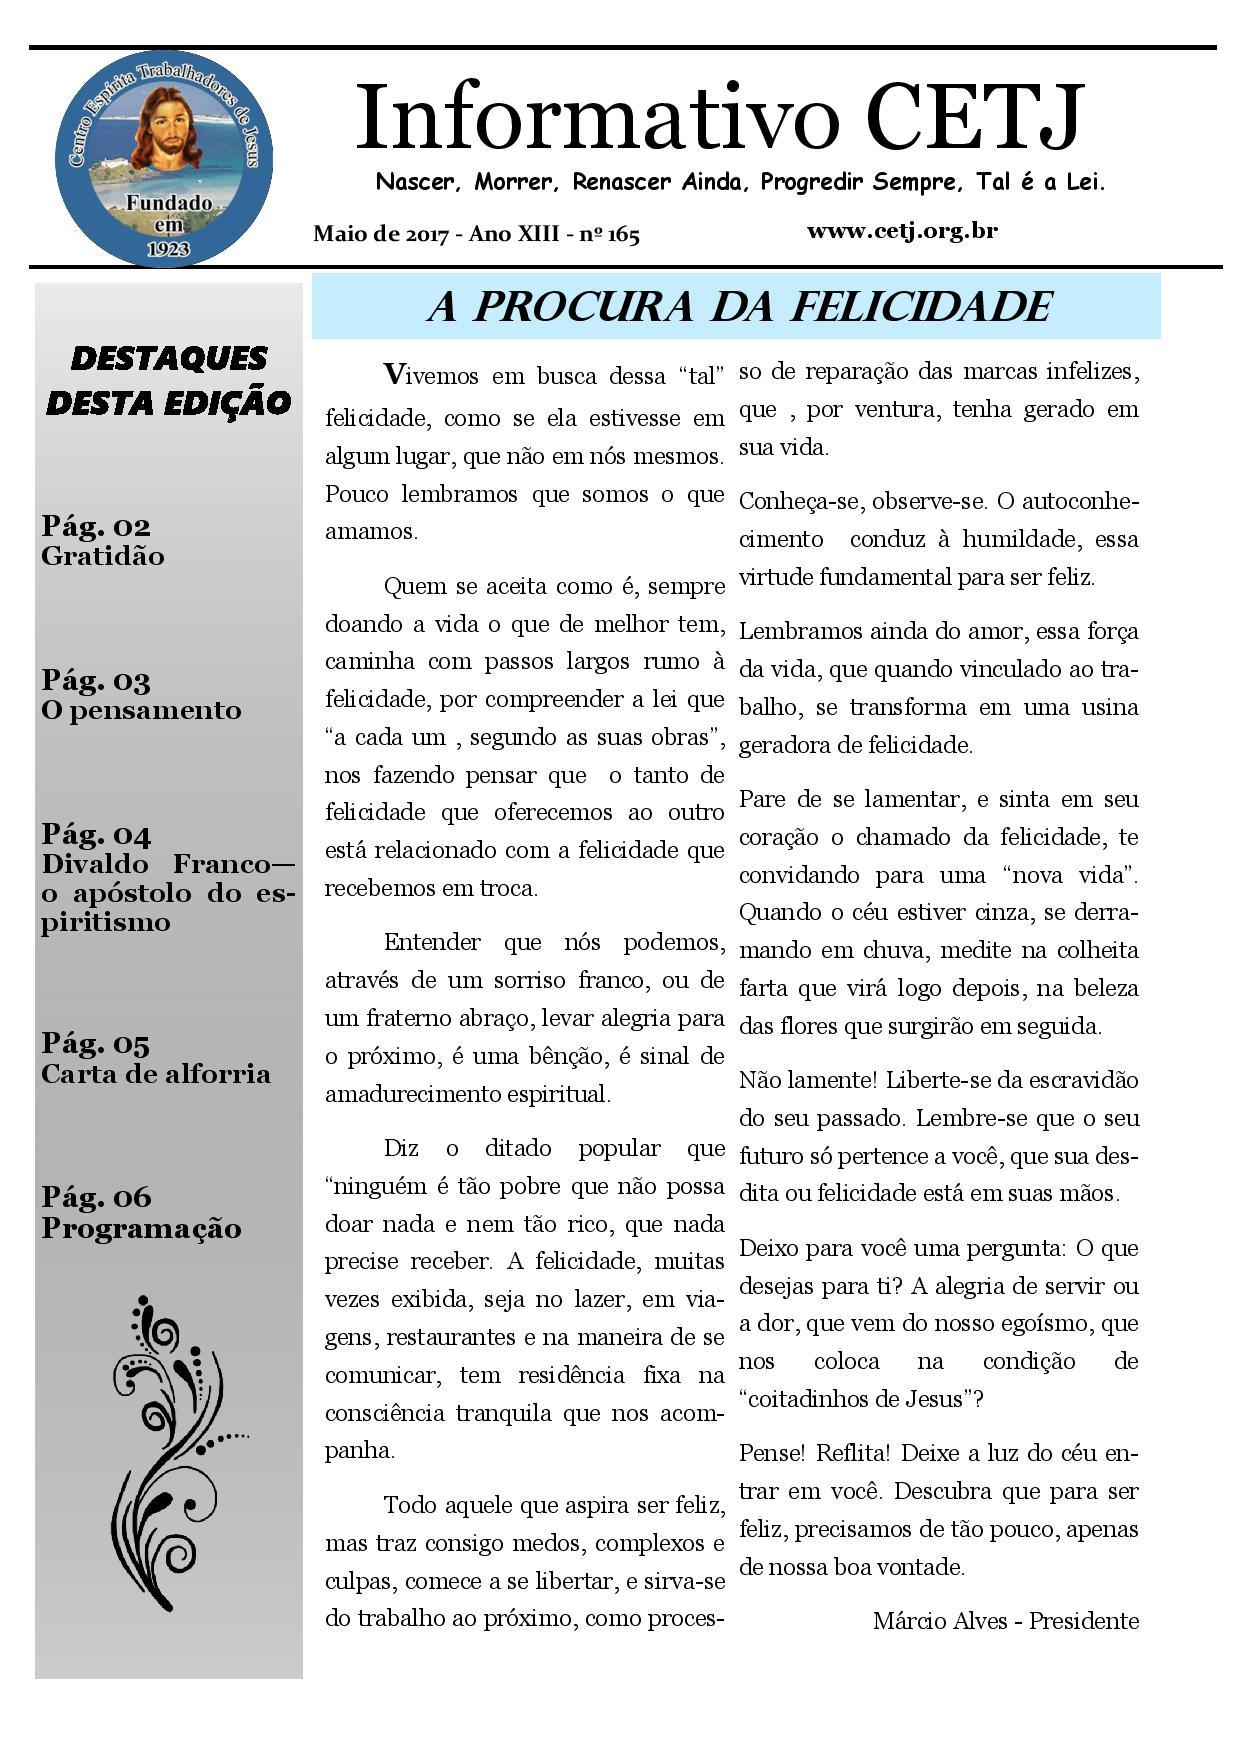 Informativo maio de 2017_net-page-001